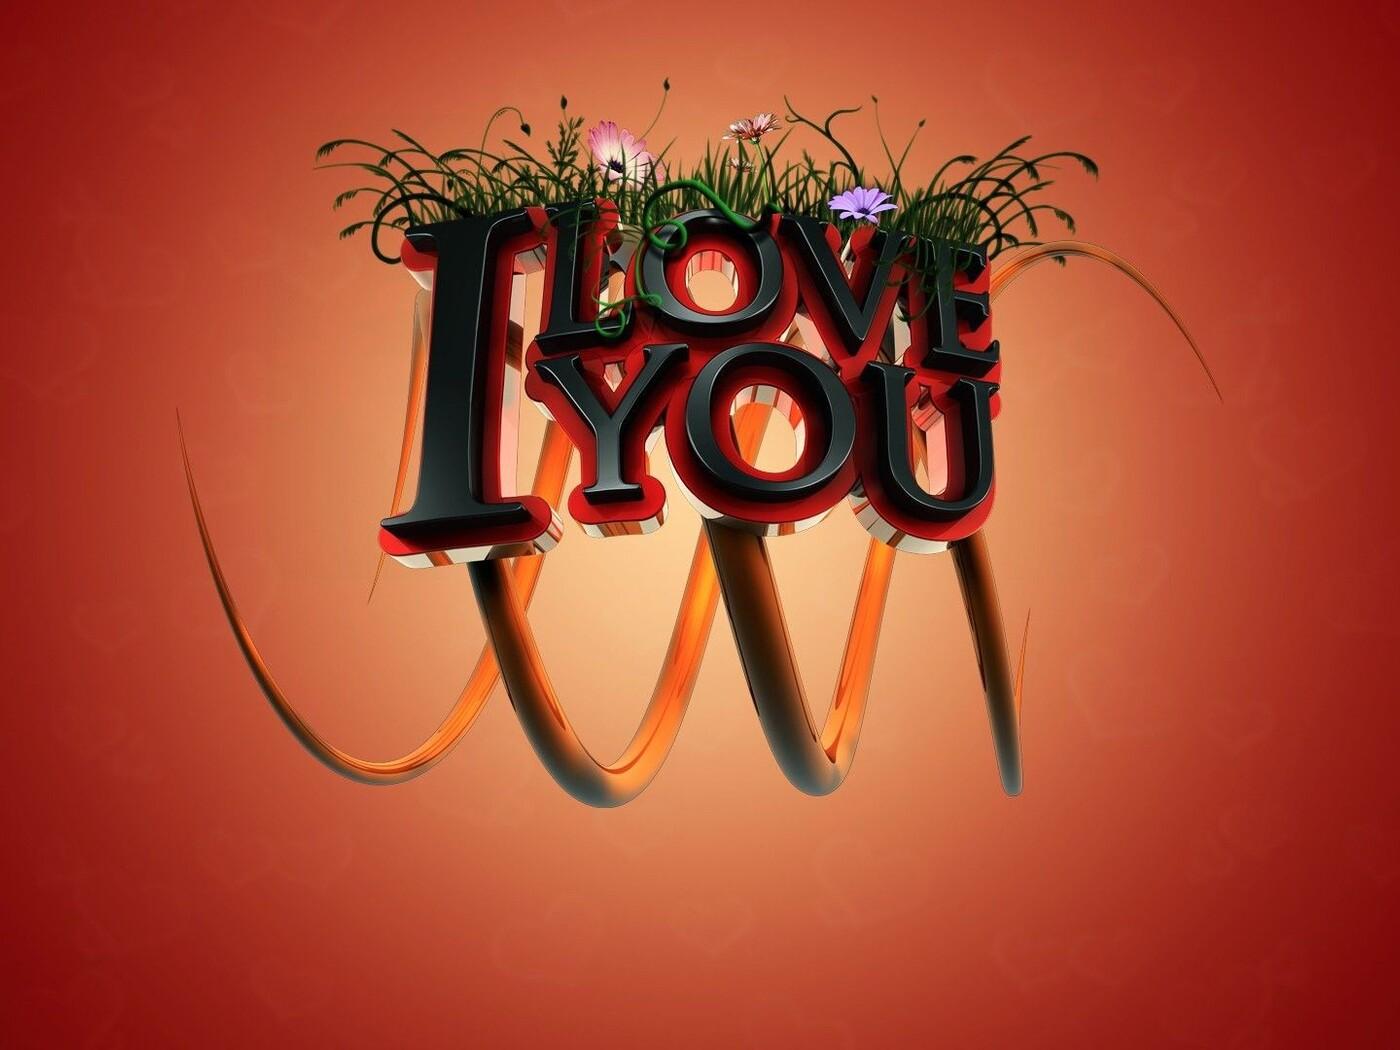 i-love-you-typo-4k.jpg